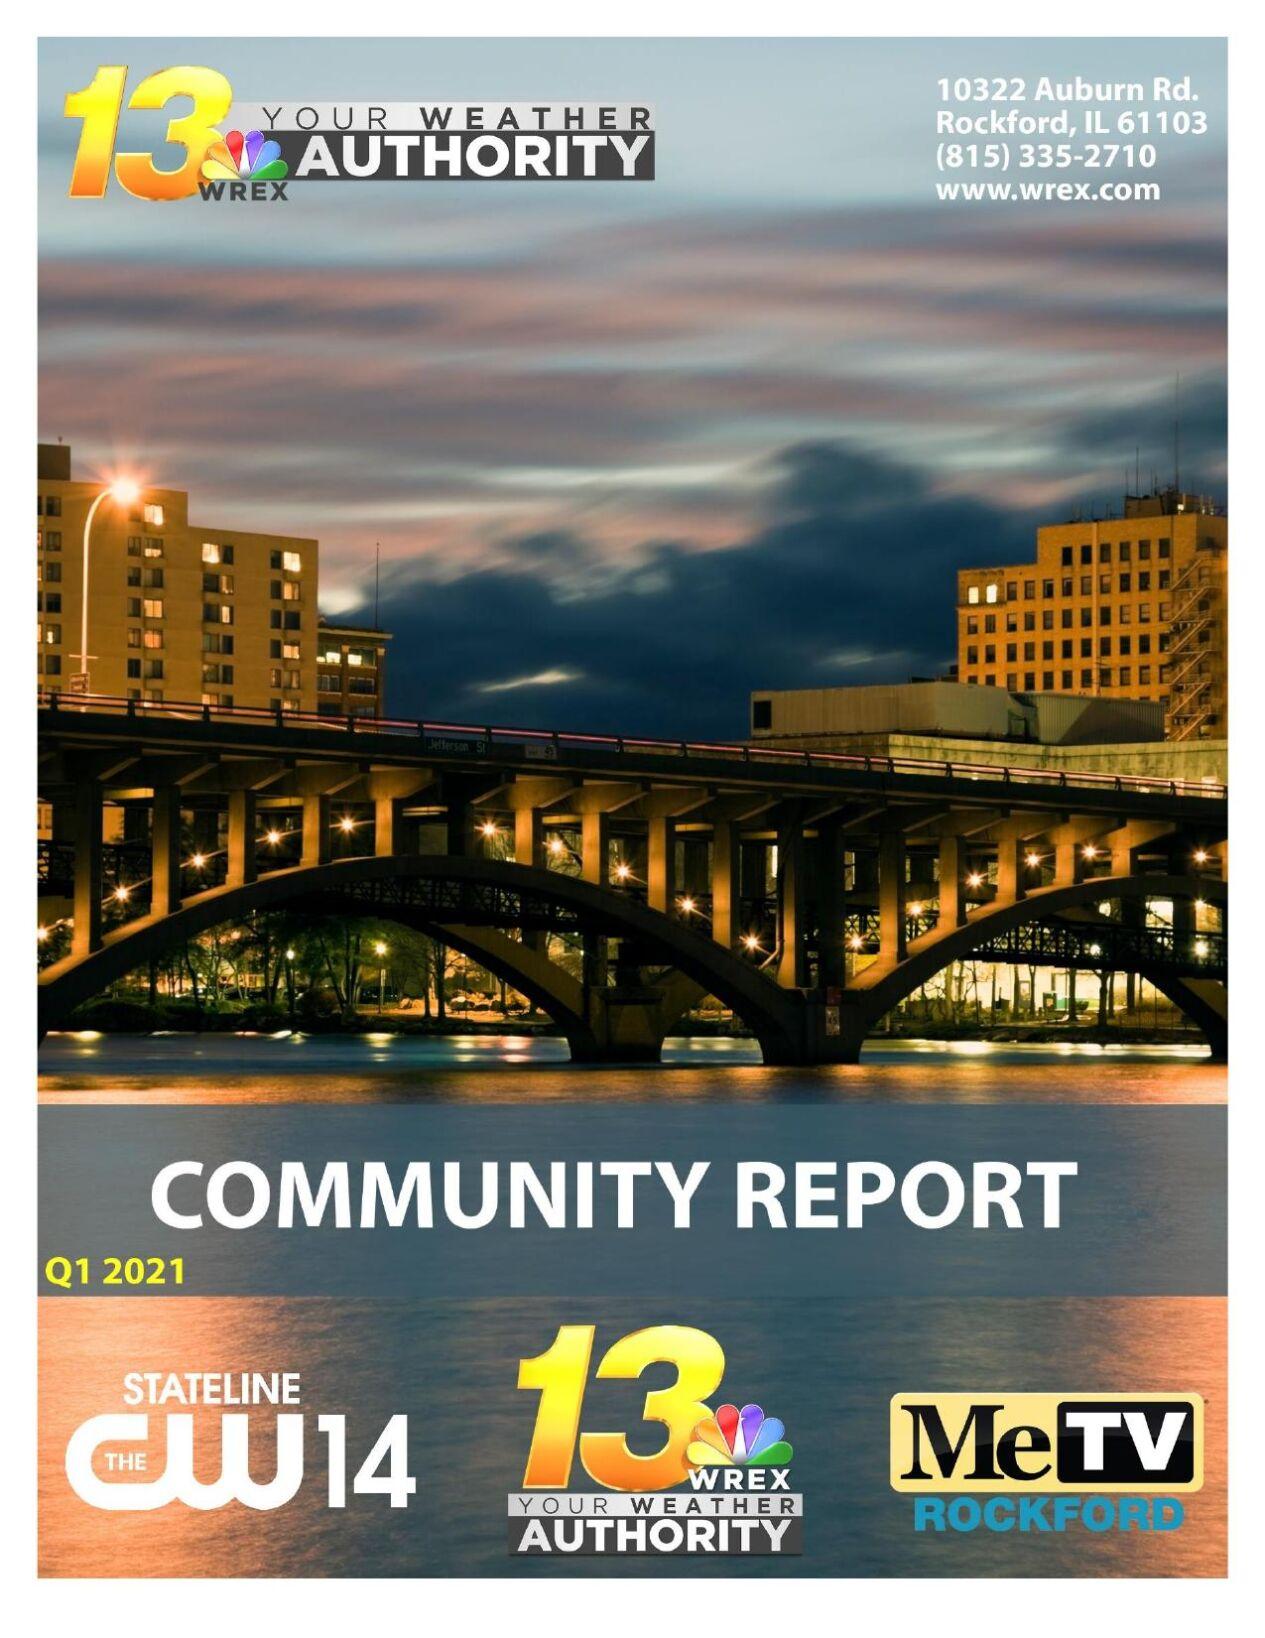 13 WREX Community Service Report (Q1)